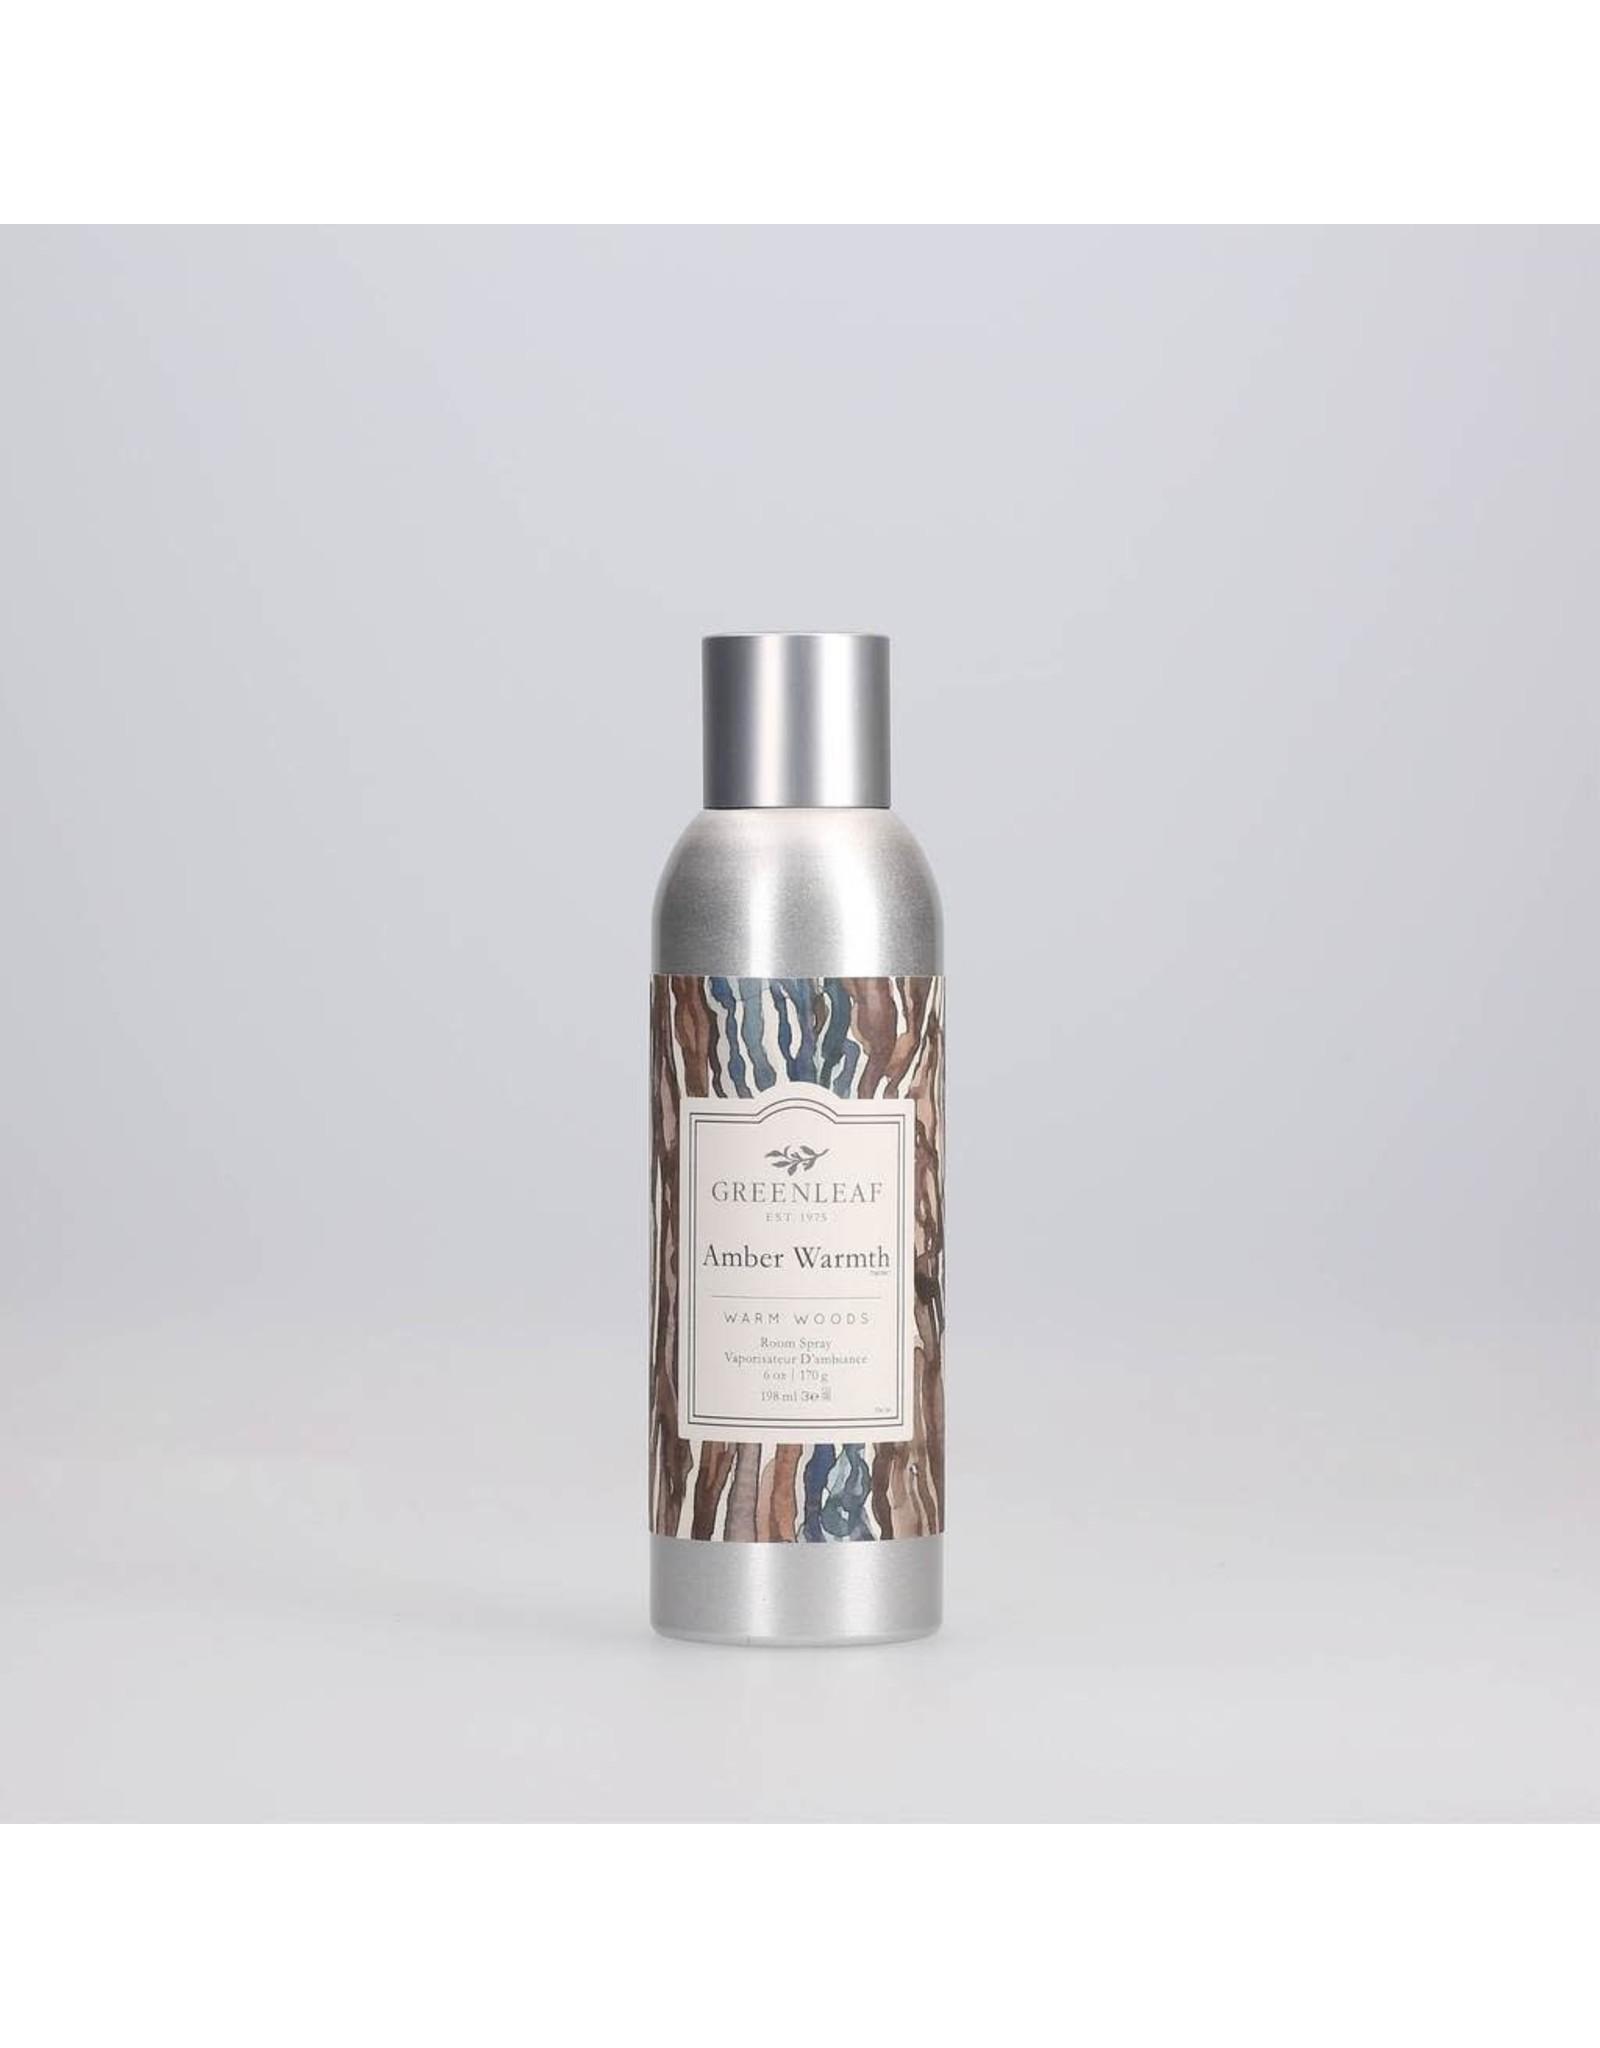 Amber Warmth Room Spray